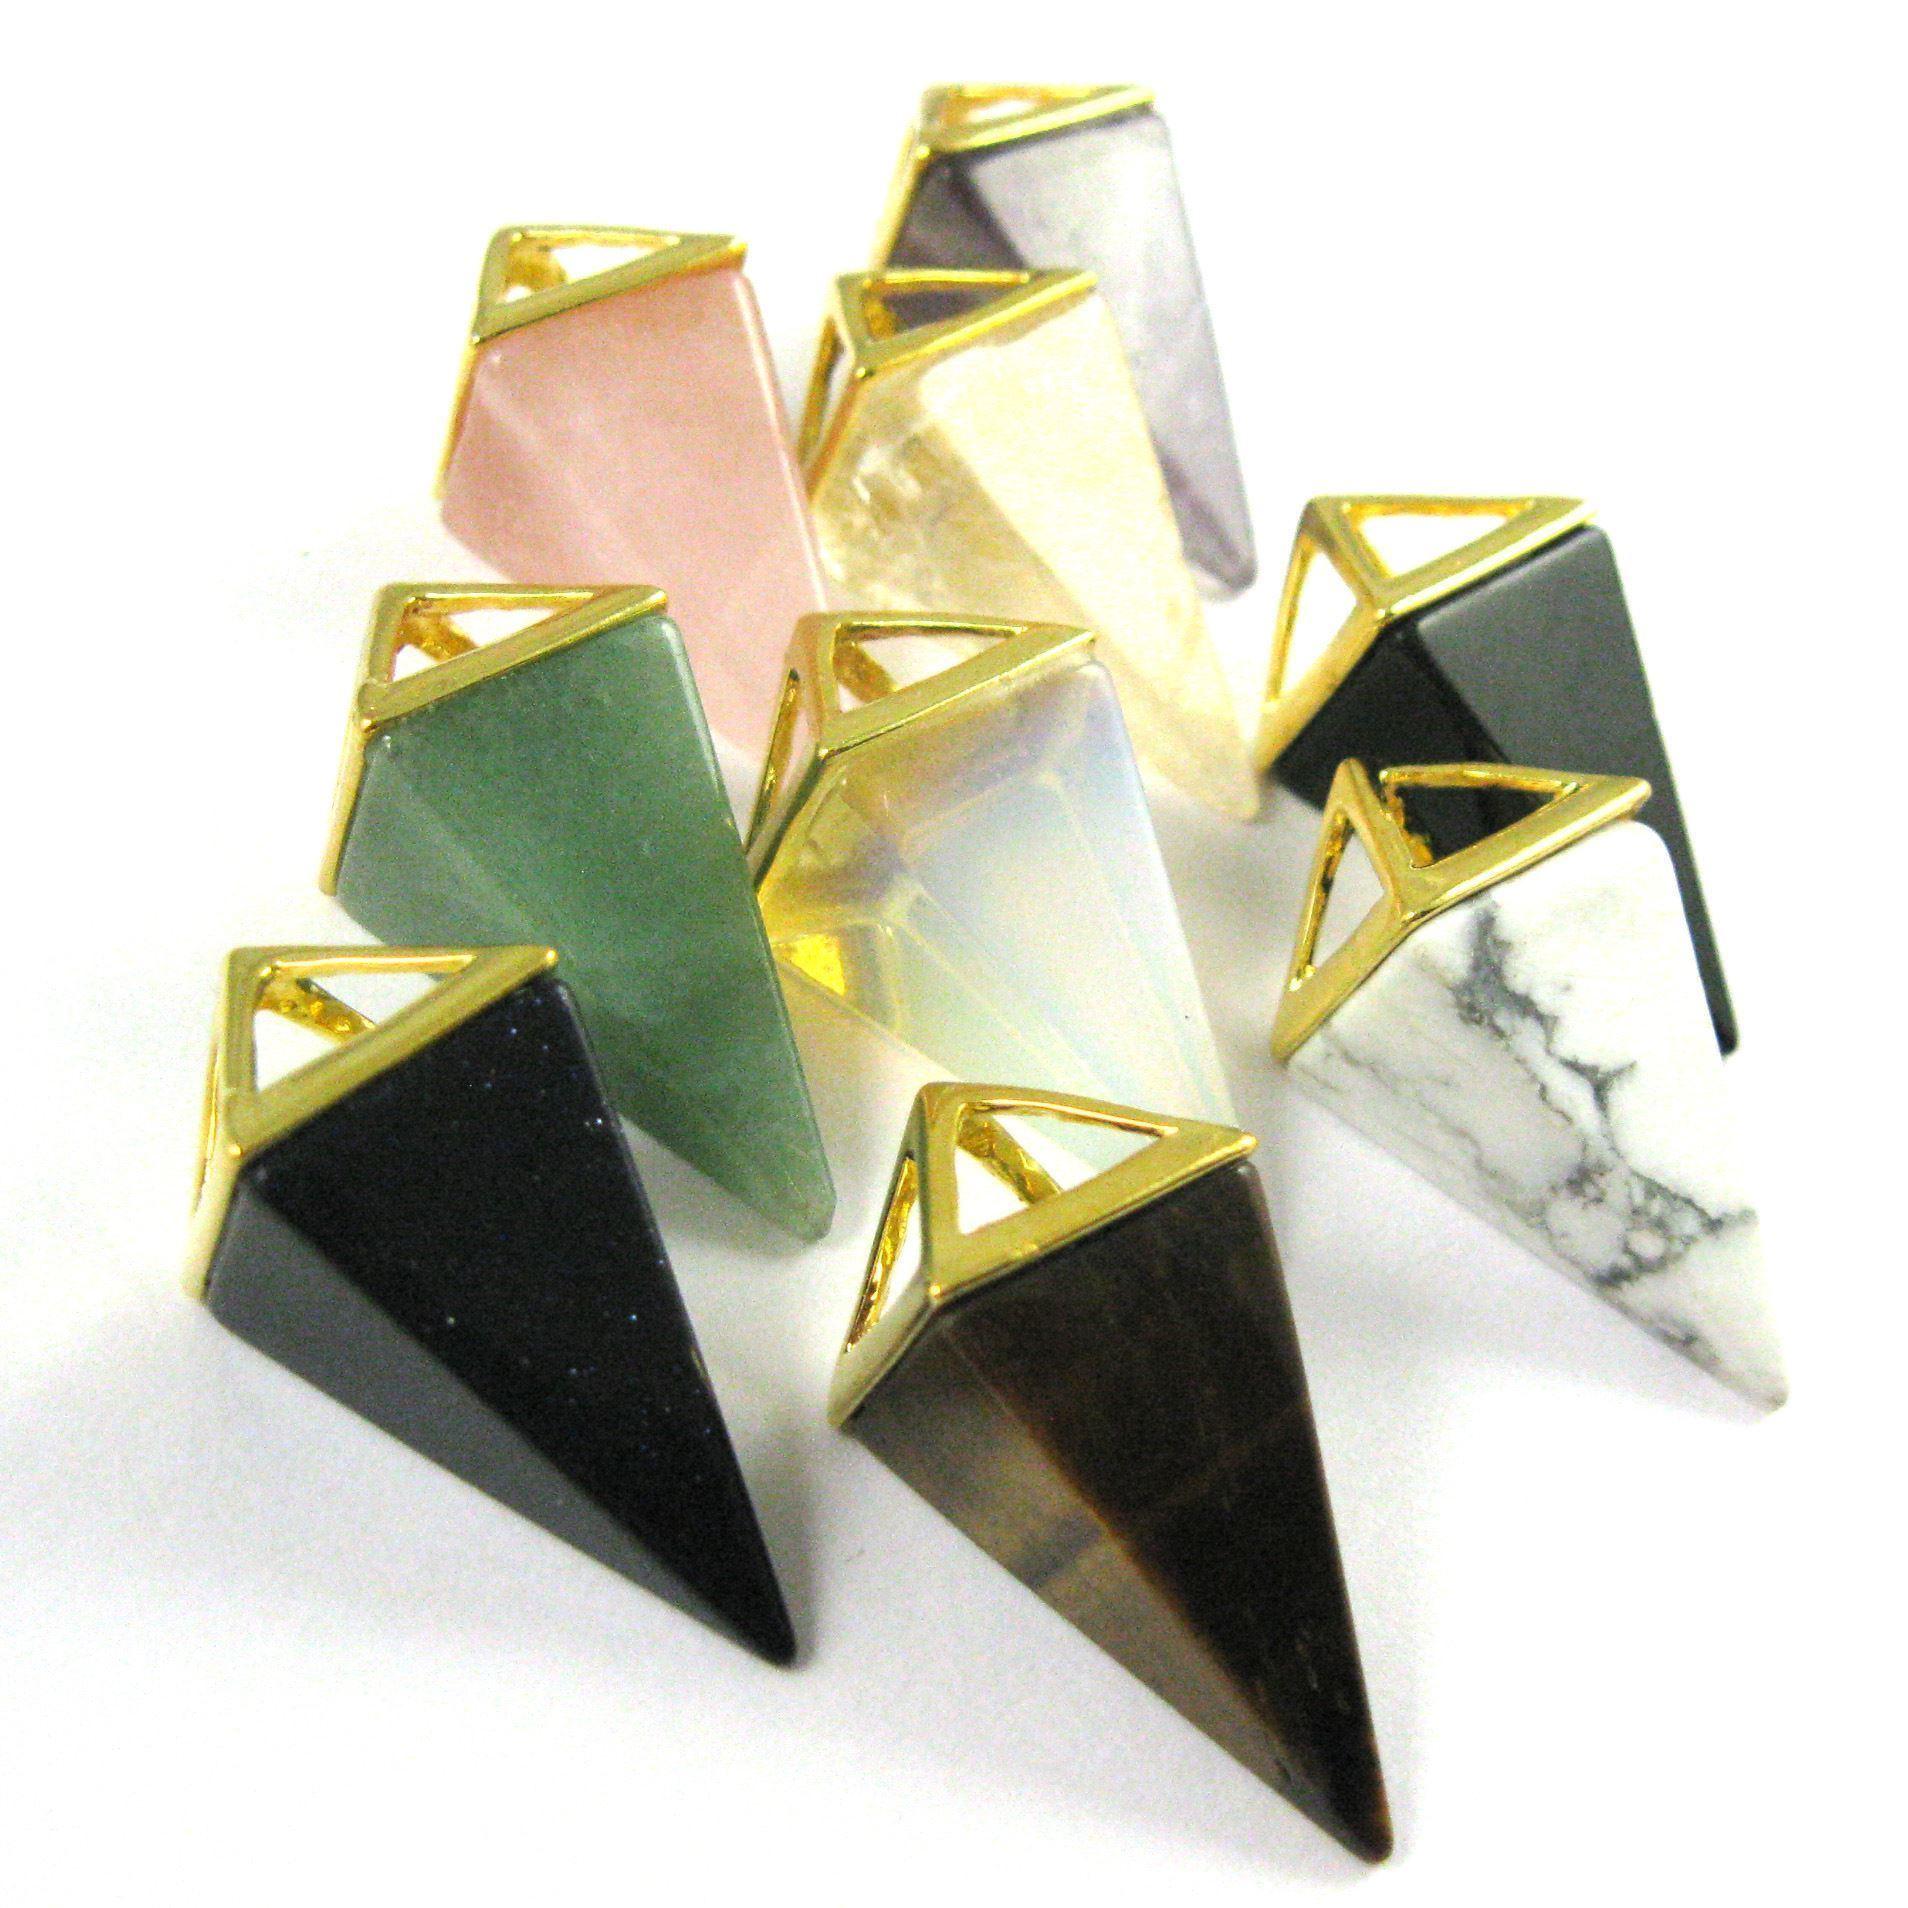 Natural Gemstone Pyramid Pendant- Point Spike Pendant, Double Pyramid Gem - White Howlite - 34mm